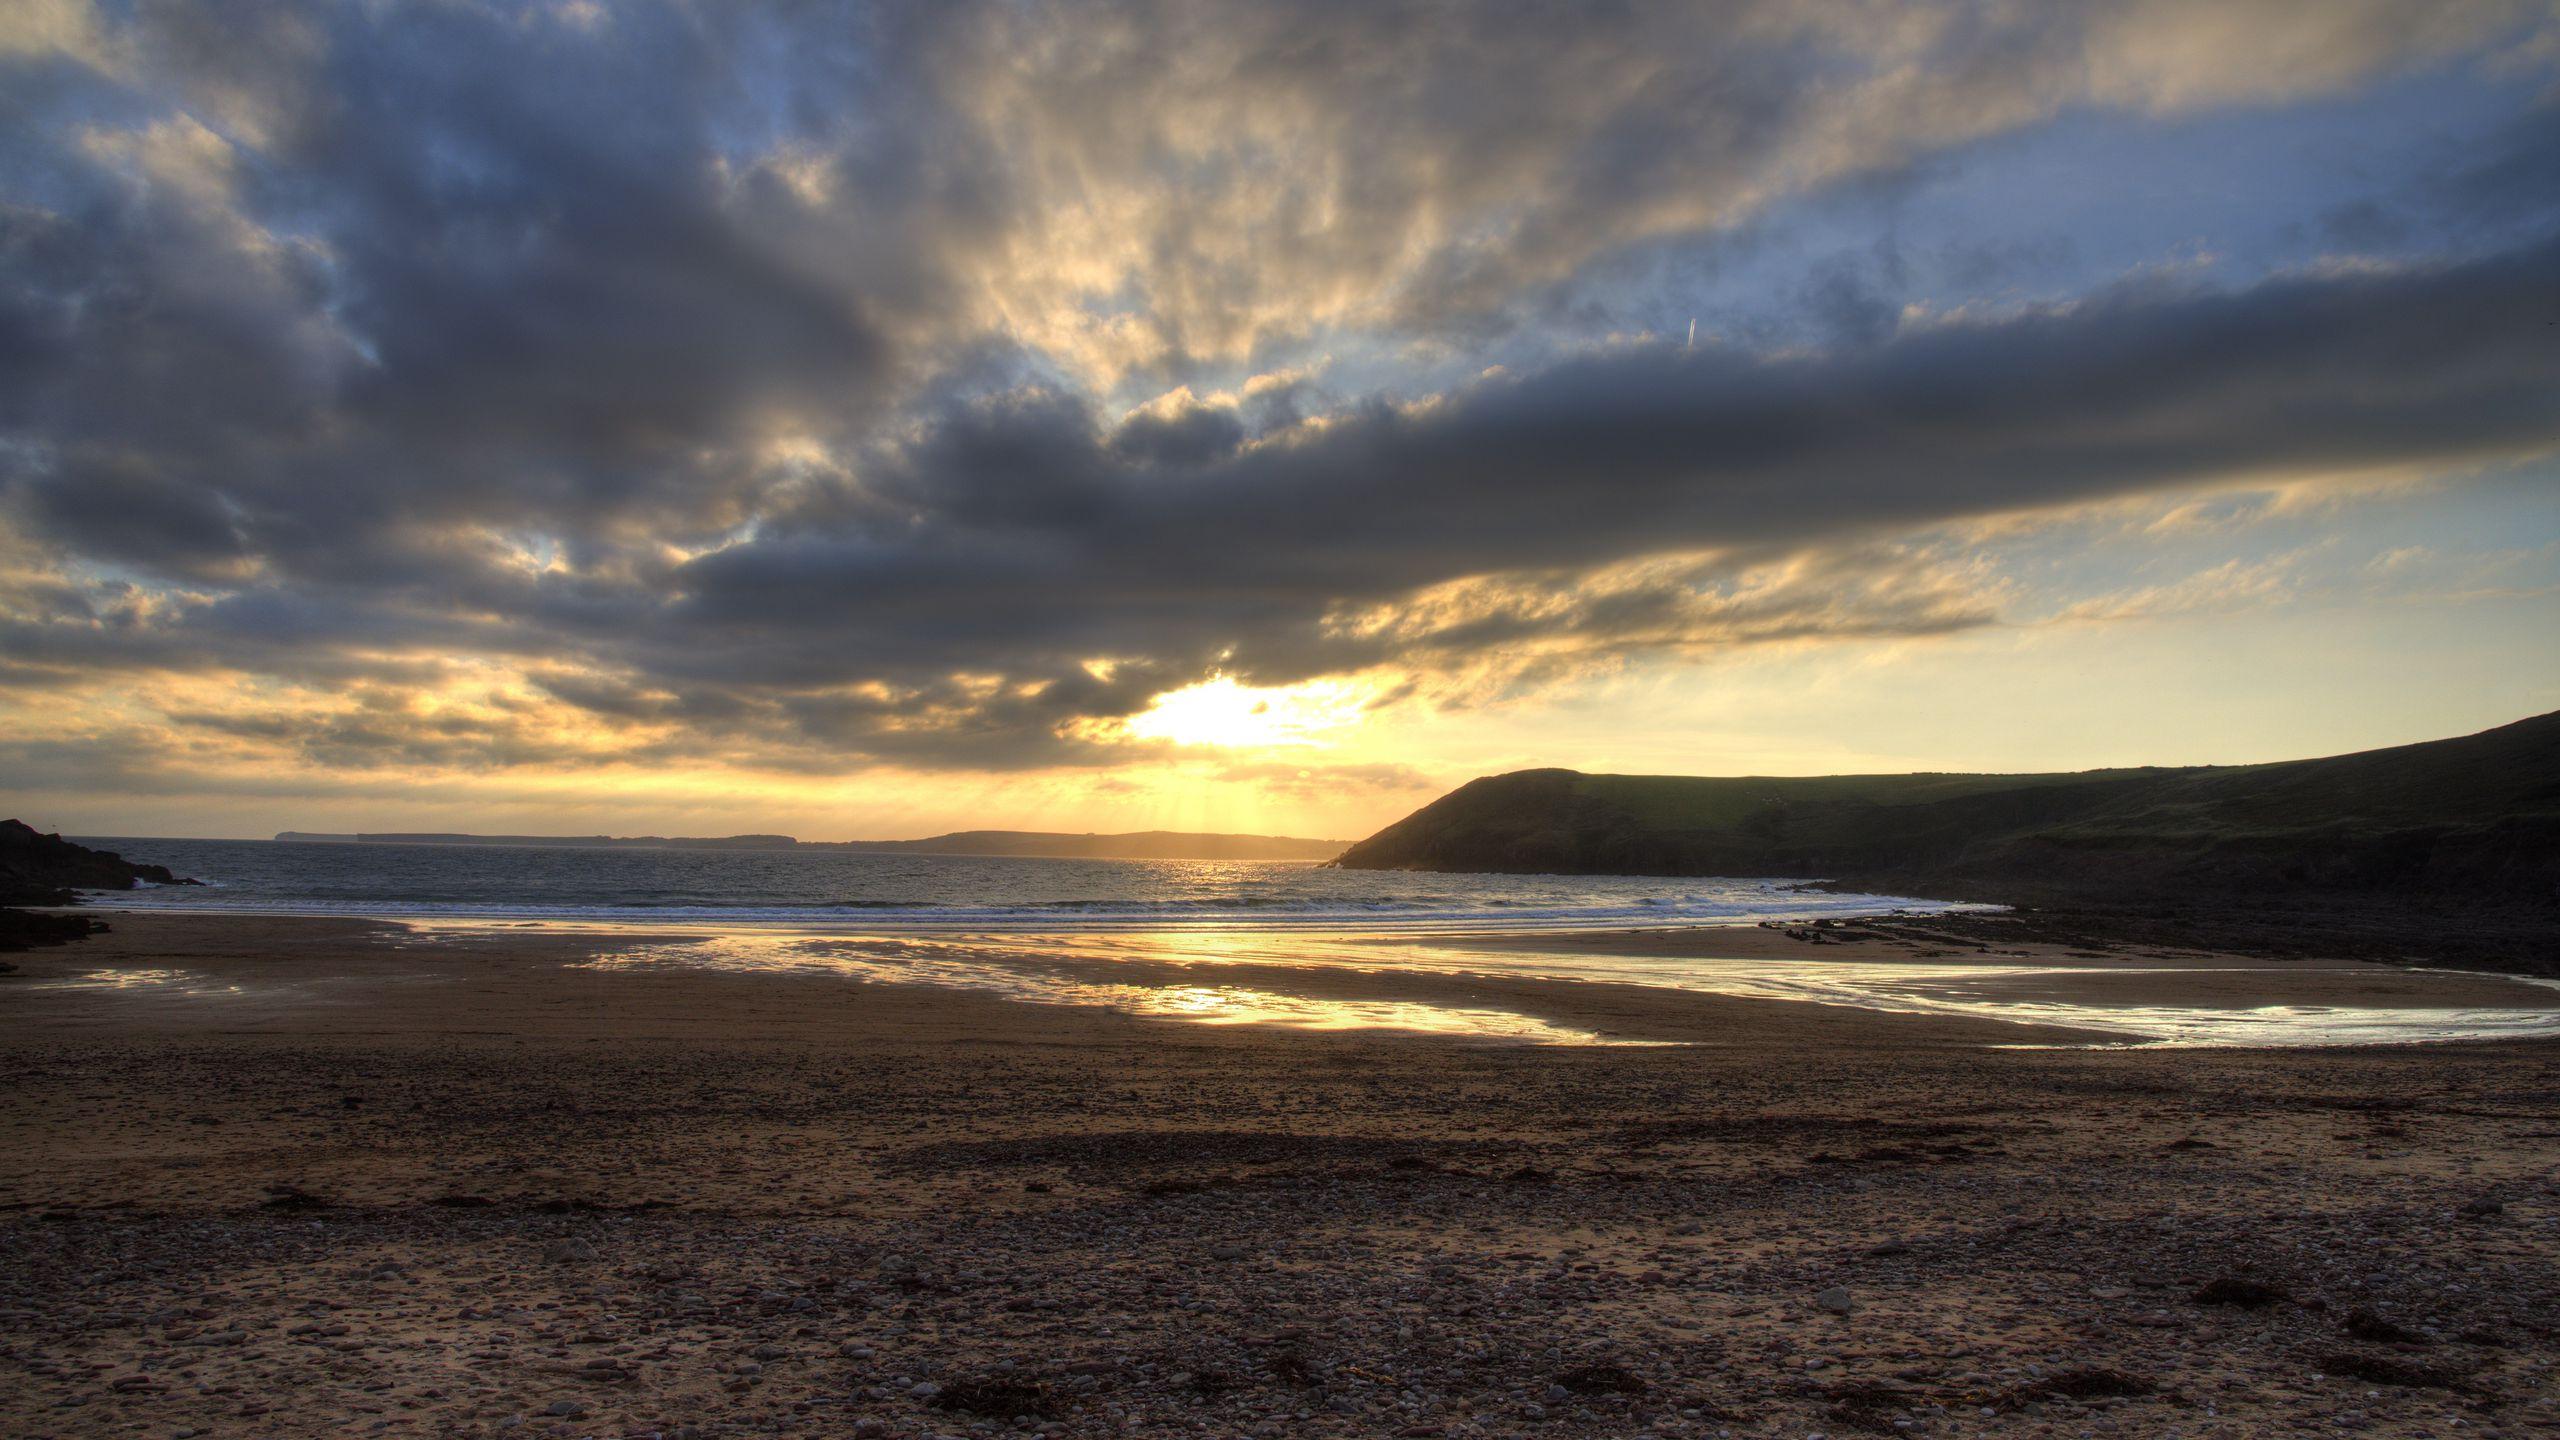 2560x1440 Wallpaper shore, water, sunset, landscape